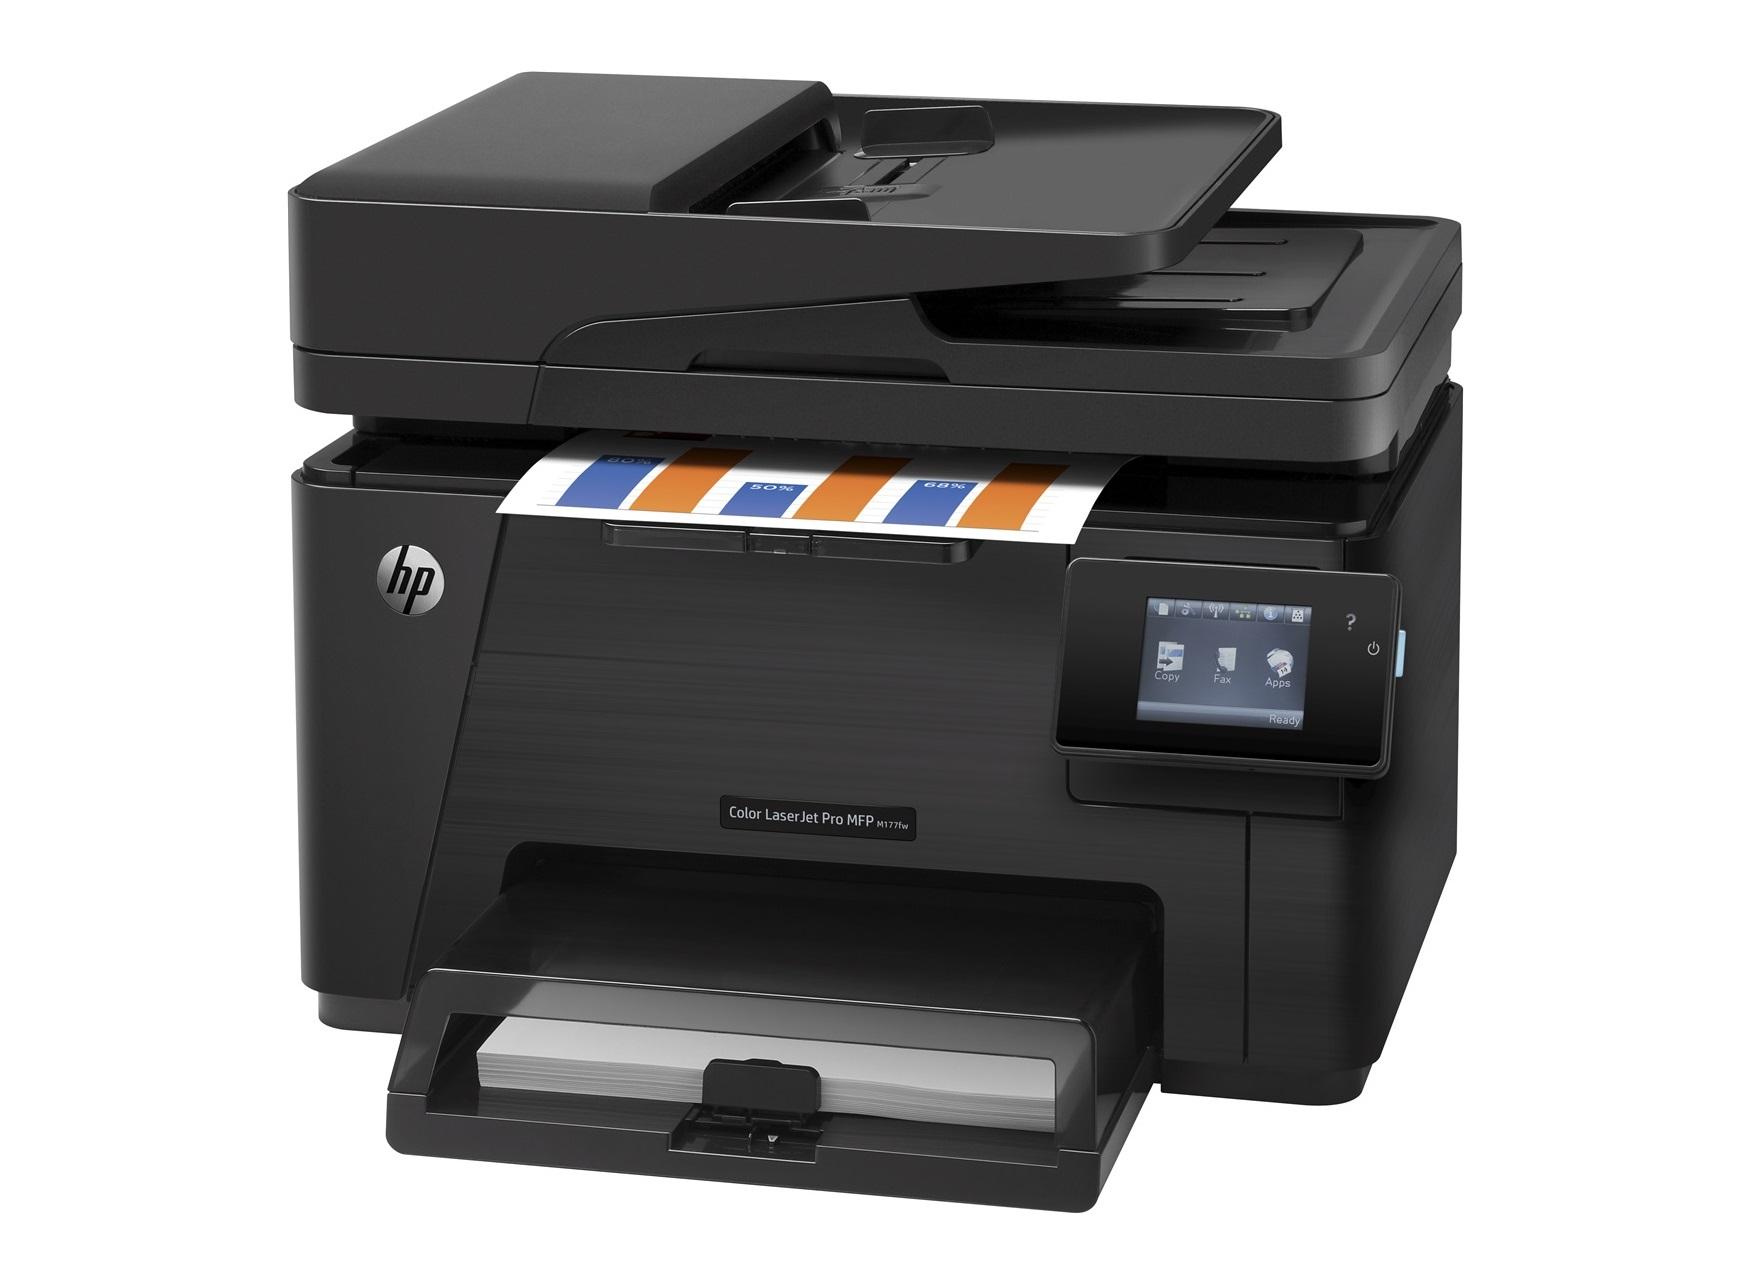 HP CLJ Pro MFP M177fw (A4, 16/4 ppm, USB 2.0, Ethernet, Wi-Fi, Print/Scan/Copy/FAX)